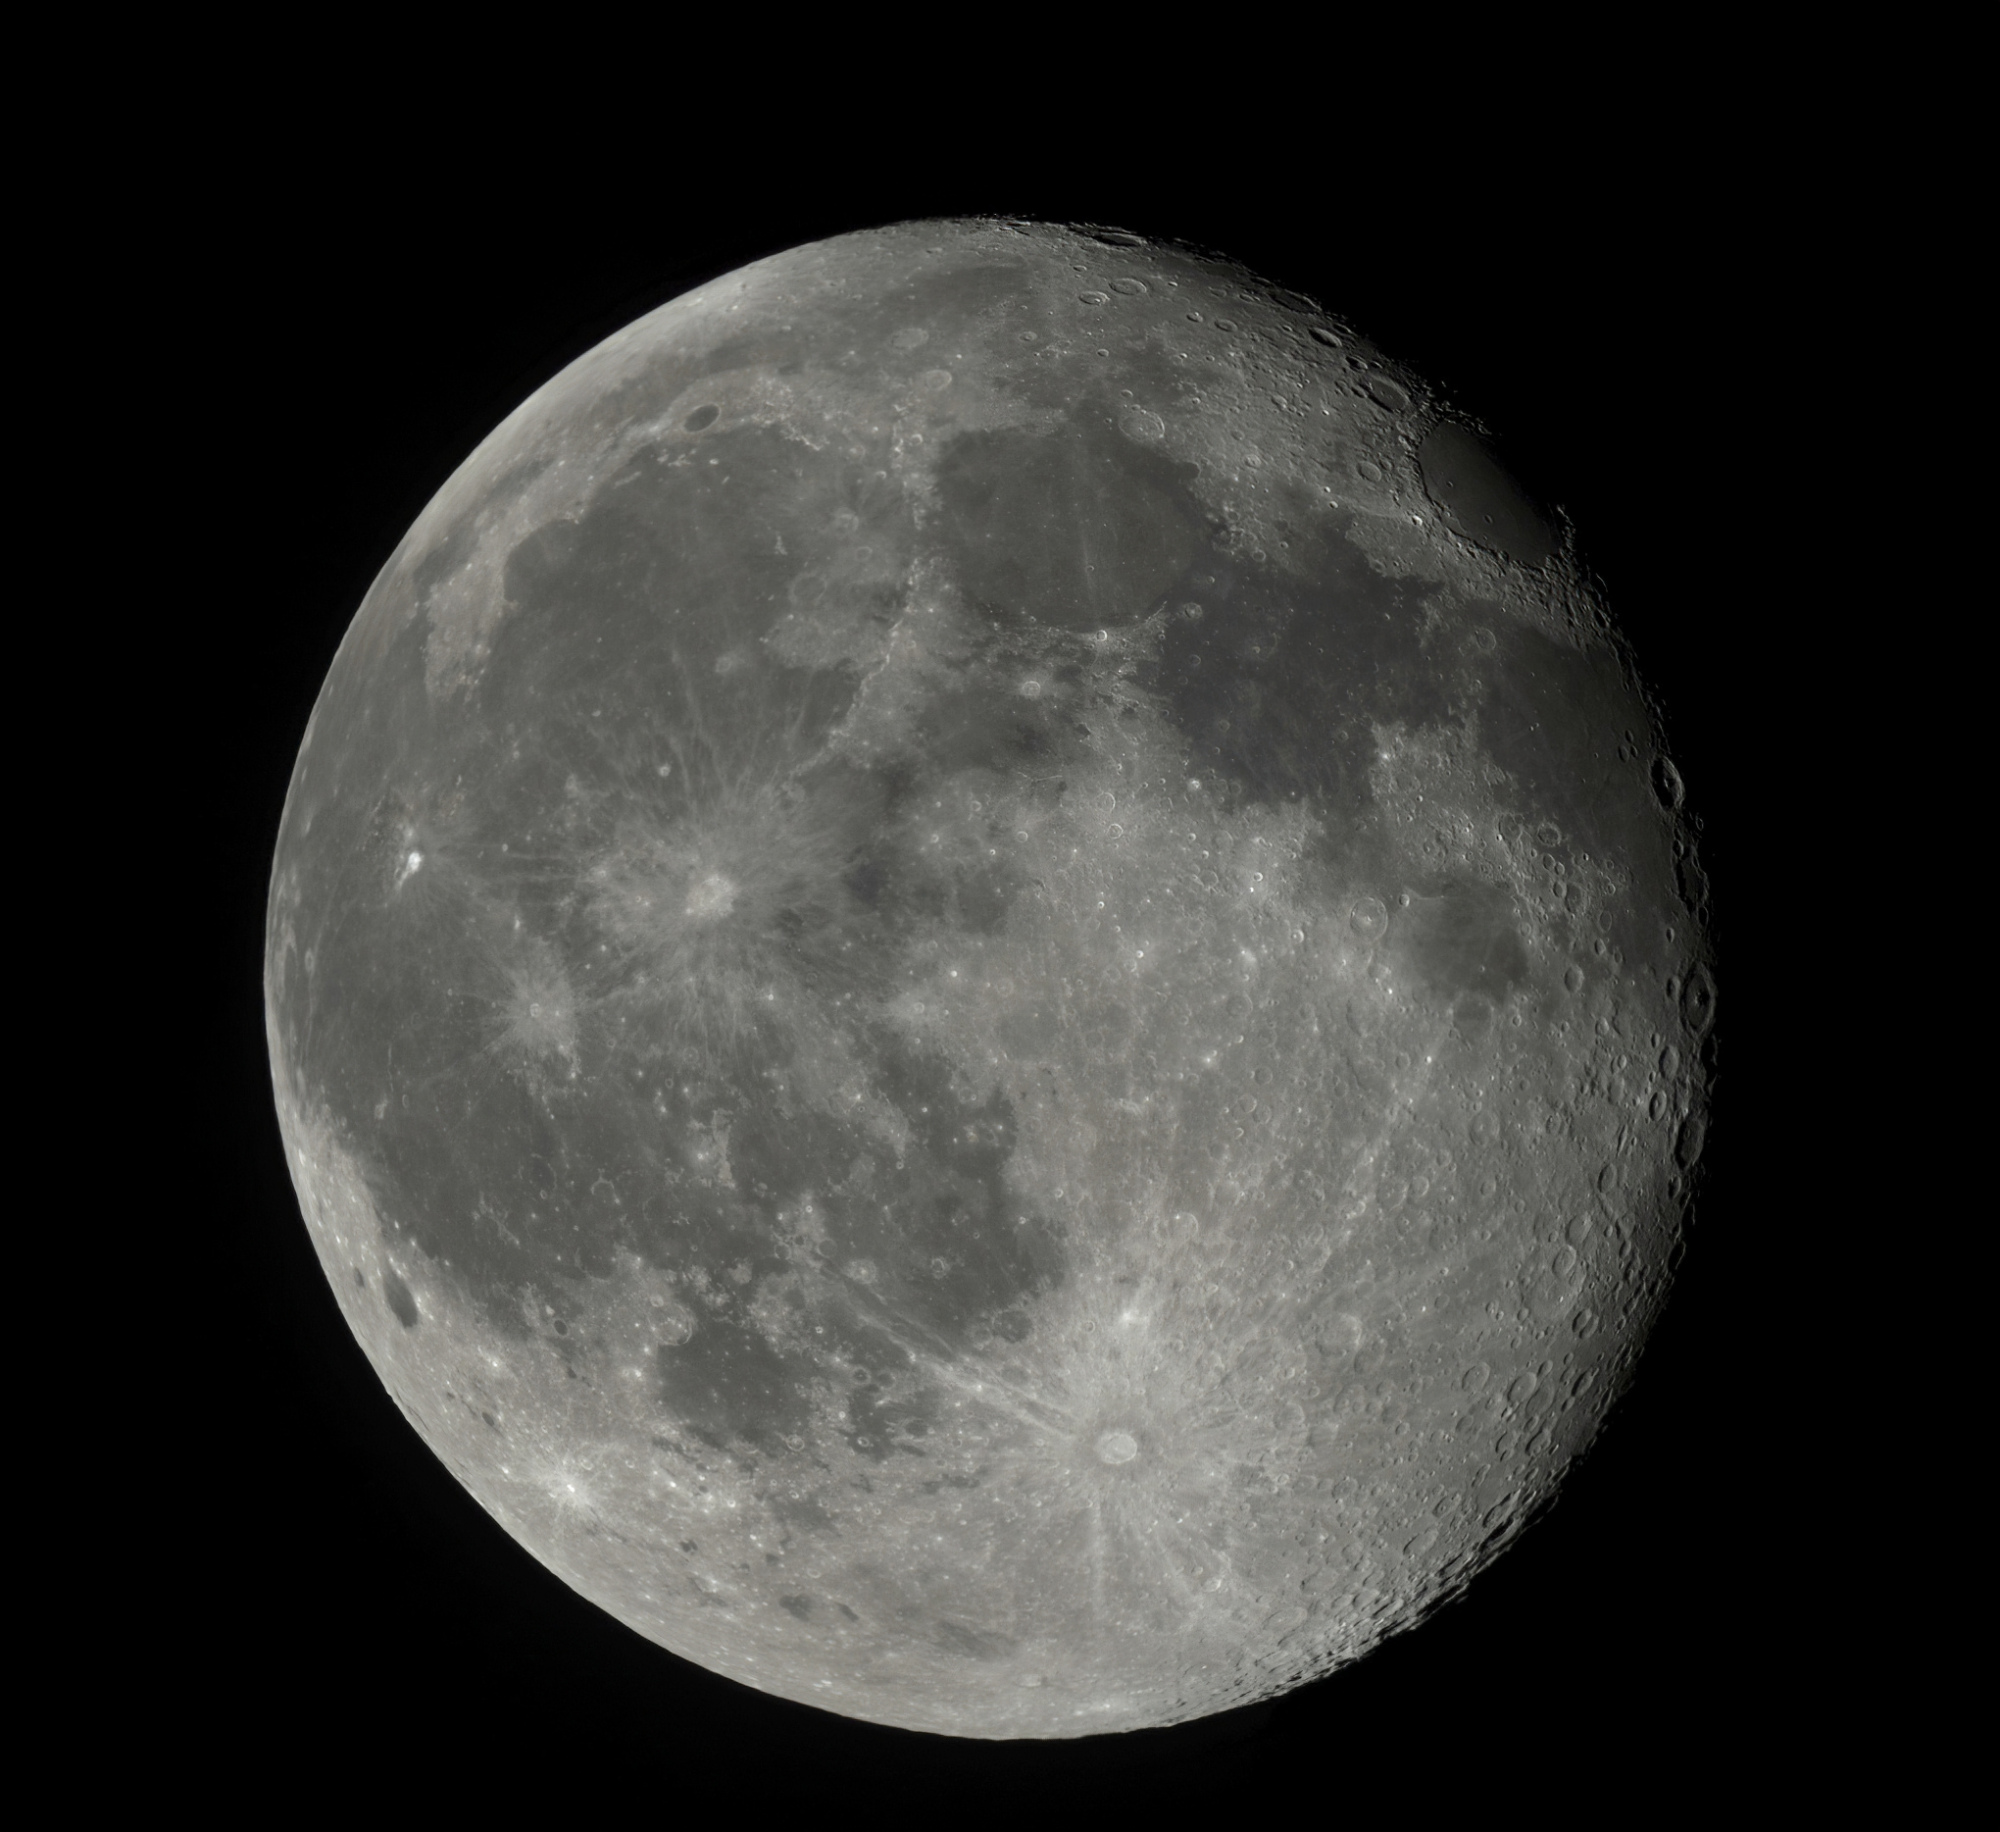 5e5361603cca1_Moon_055232_110220_ZWOASI224MC_RGB_AS_P20_lapl4_ap652_stitch80ED-1-sharpen-sharpen.thumb.jpeg.a618a3224a8d8169f3cdab762274c74e.jpeg